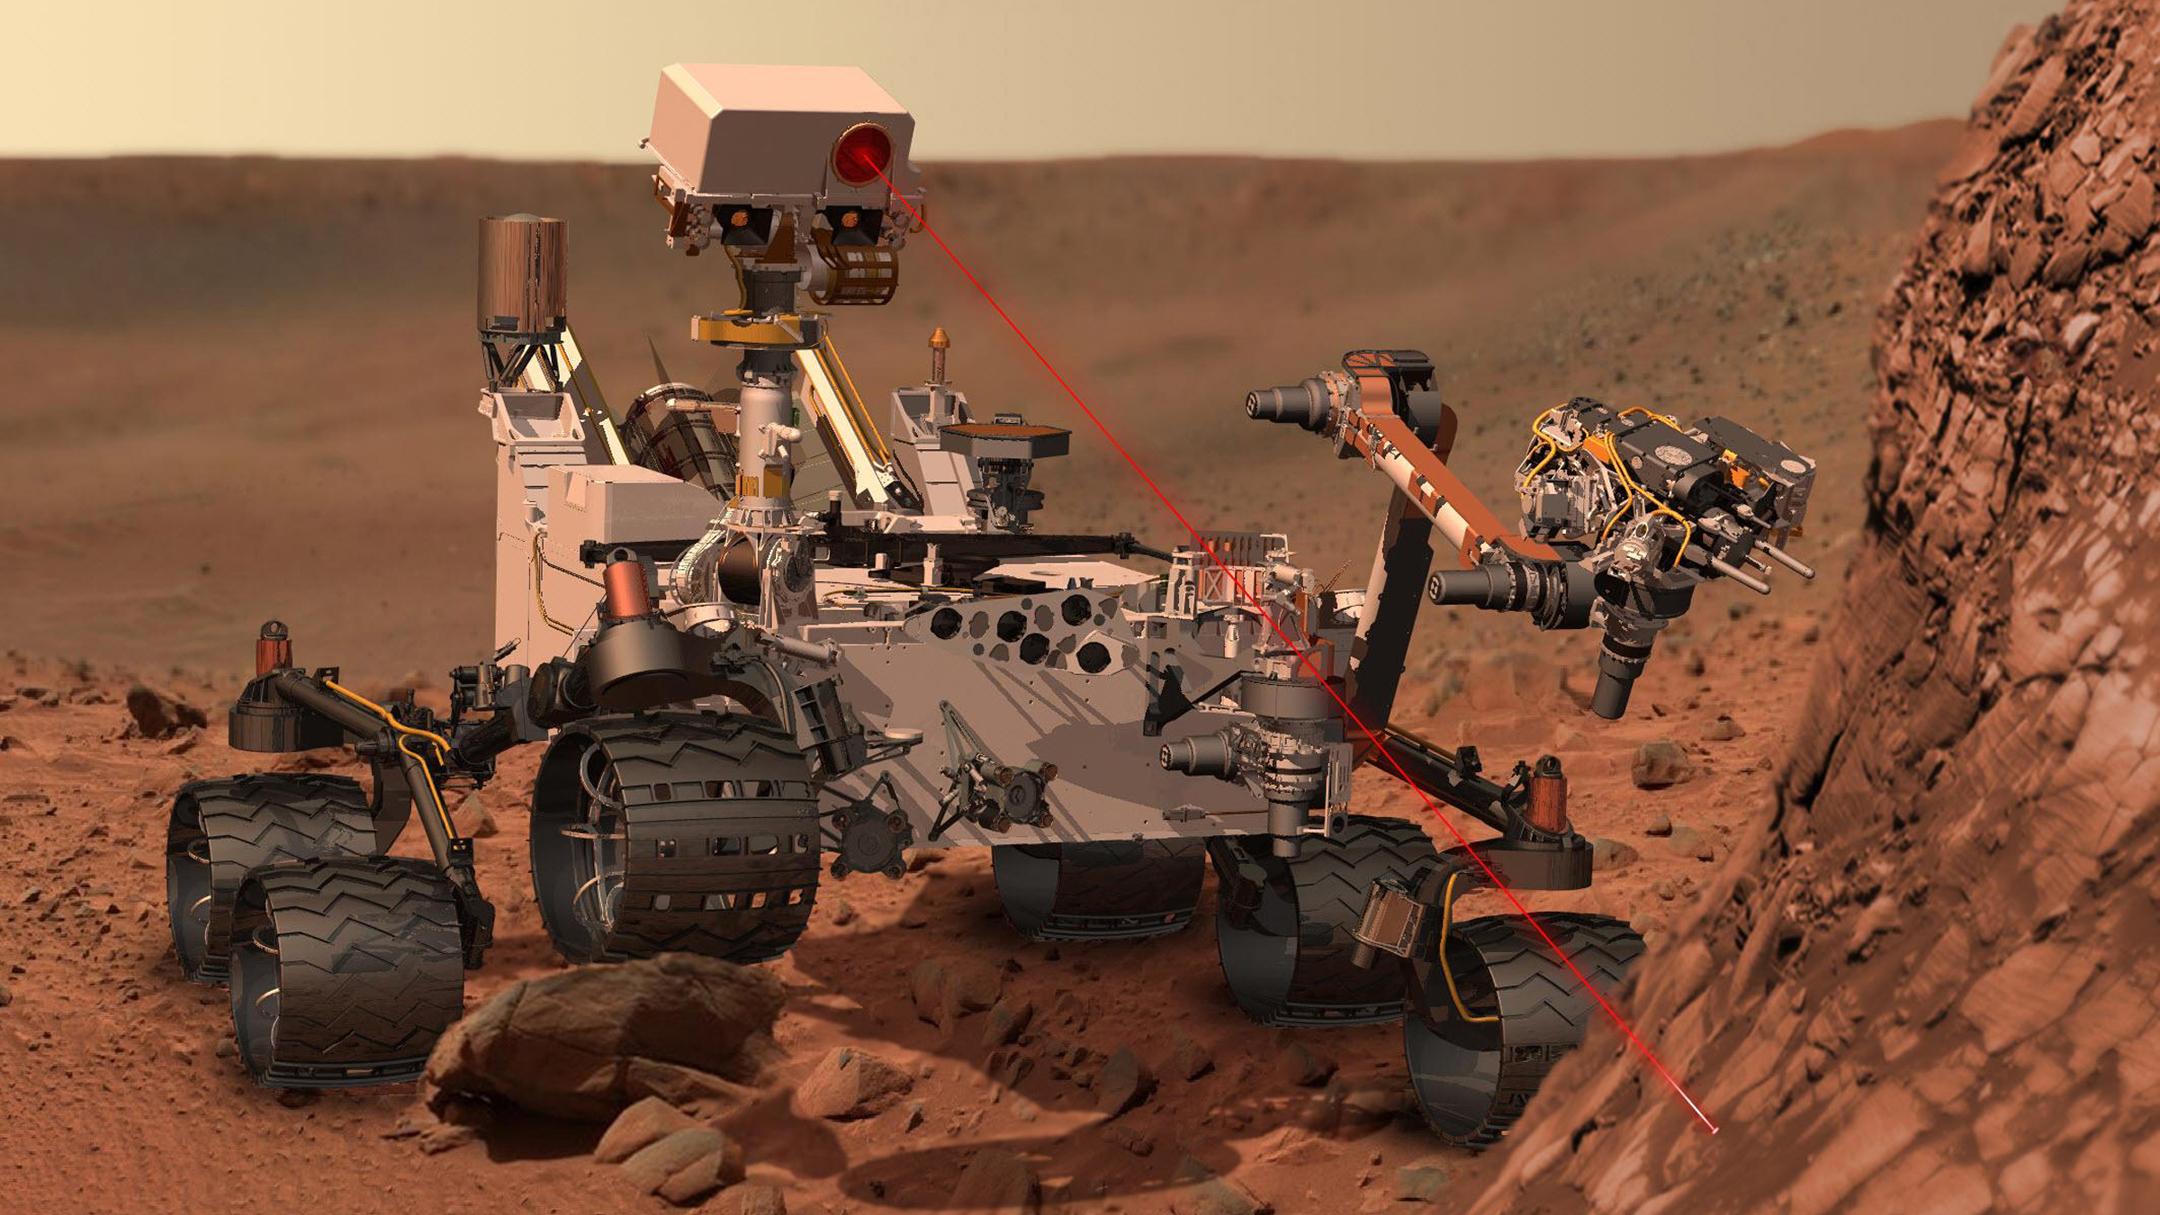 Curiosity_at_Work_on_Mars_(Artist's_Concept).jpg